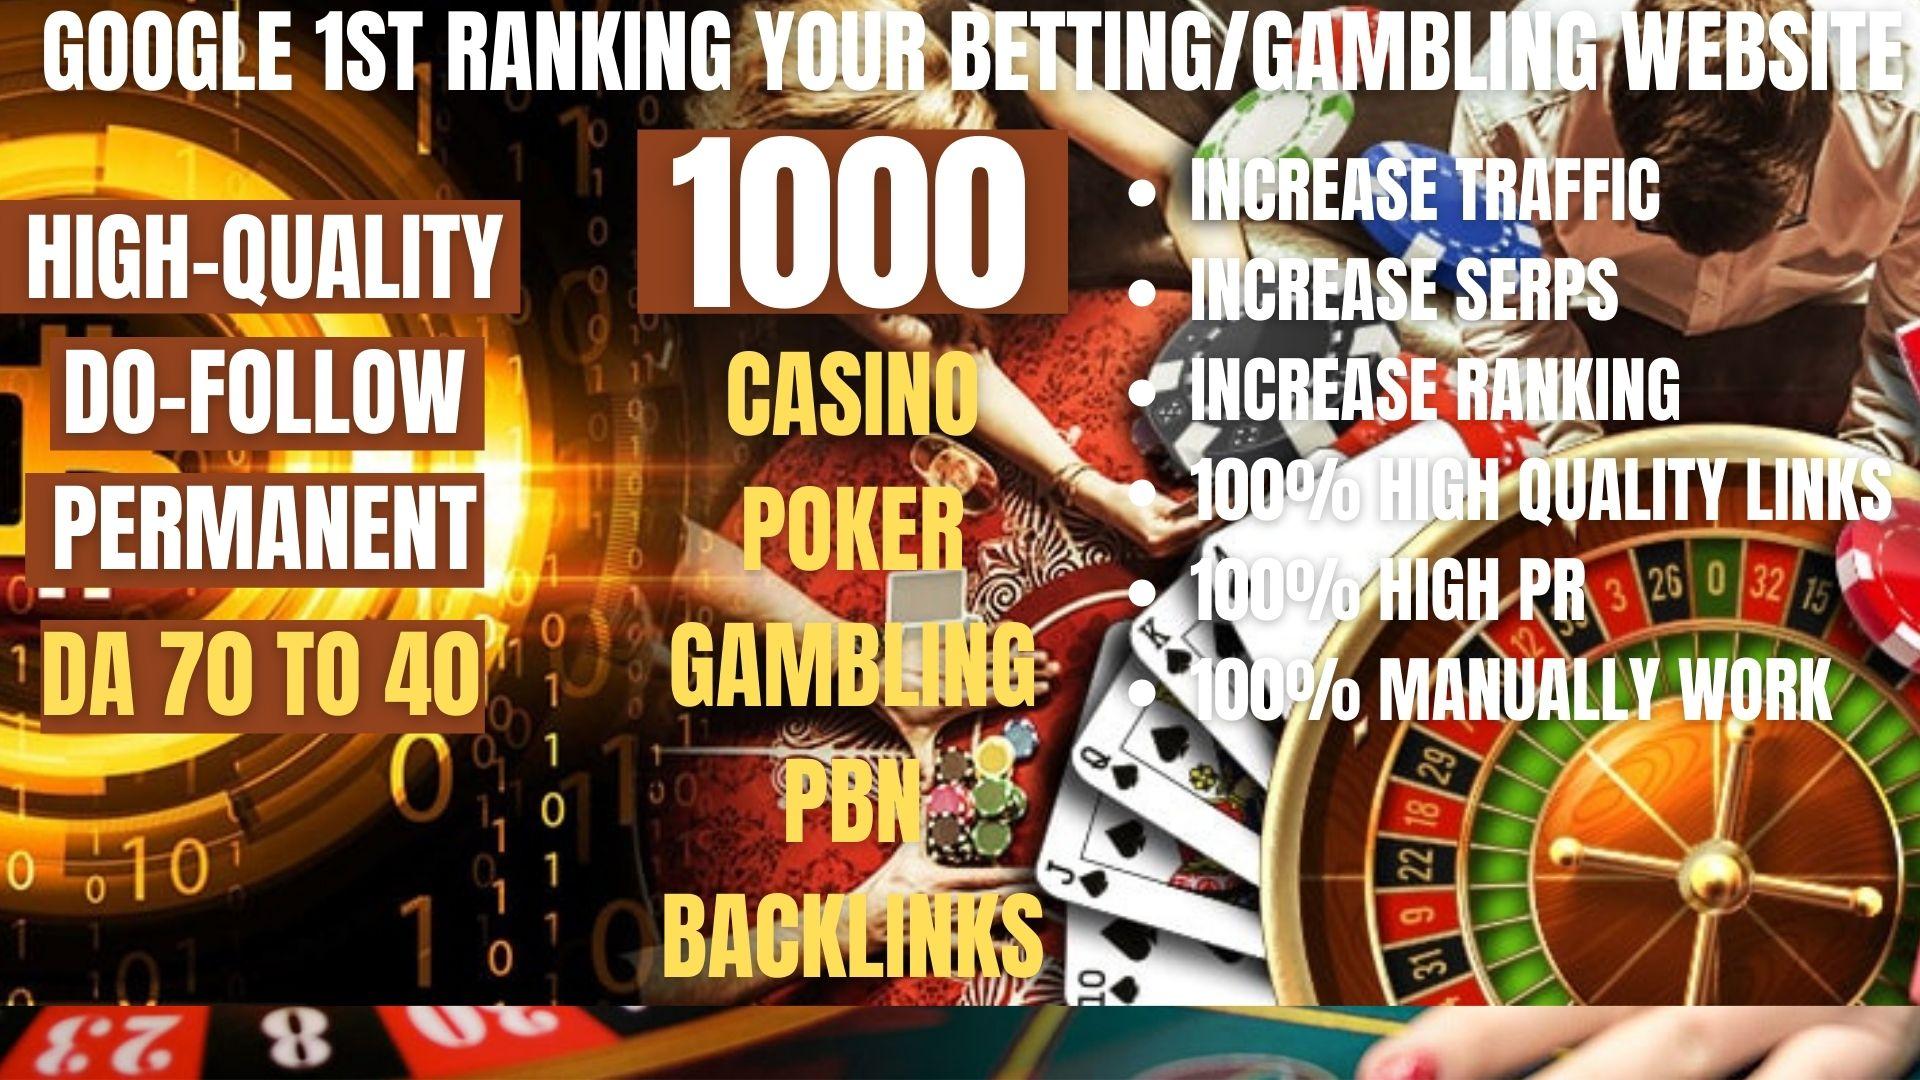 Buy one get free one 1000+ permanent casino, gambling, poker, judi pbn backlinks Casino related site